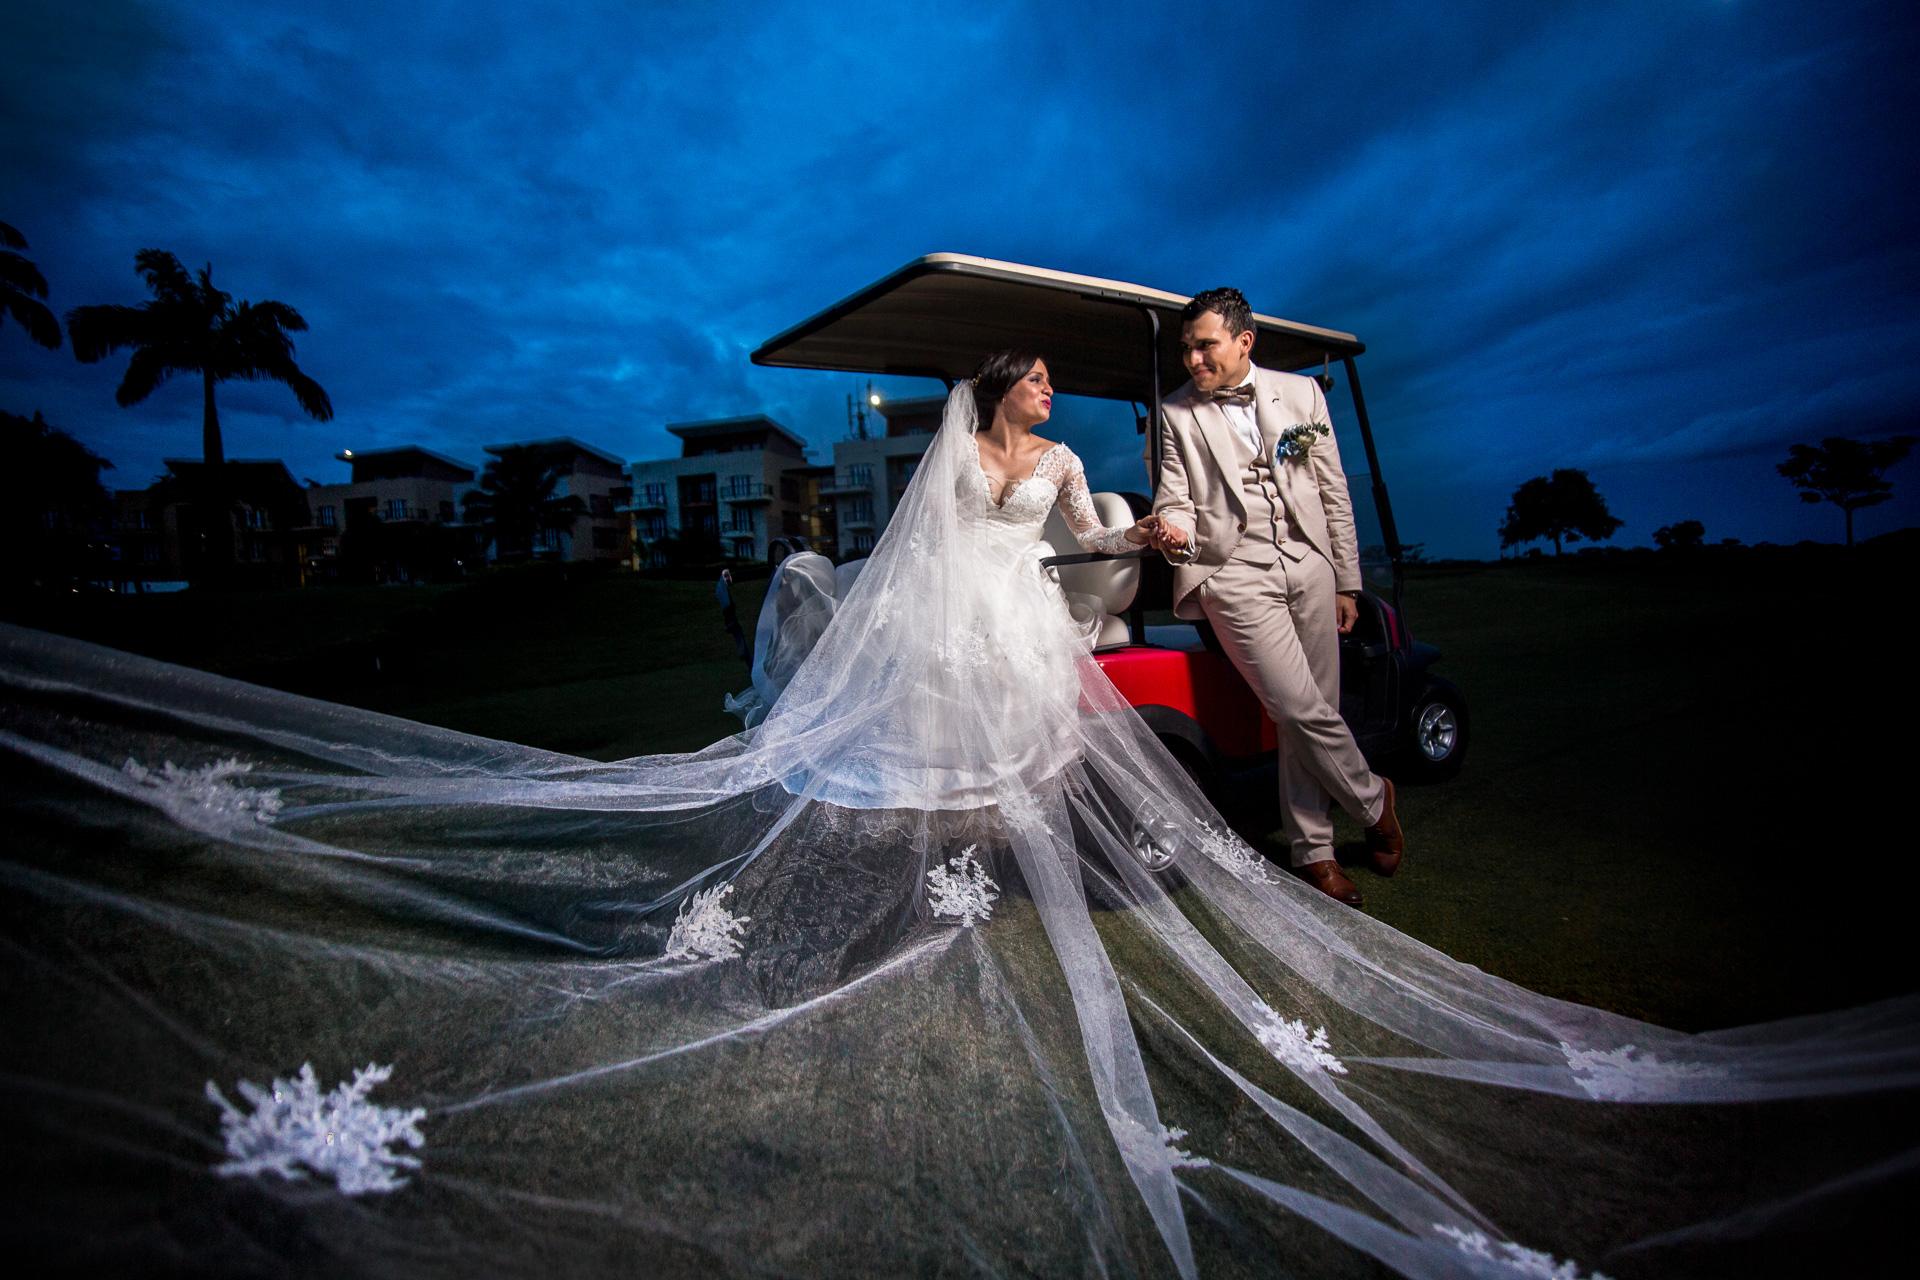 Fotógrafos-de-bodas-en-Colombia-Sthephanie-y-David-44 STEPHANIE + DAVID